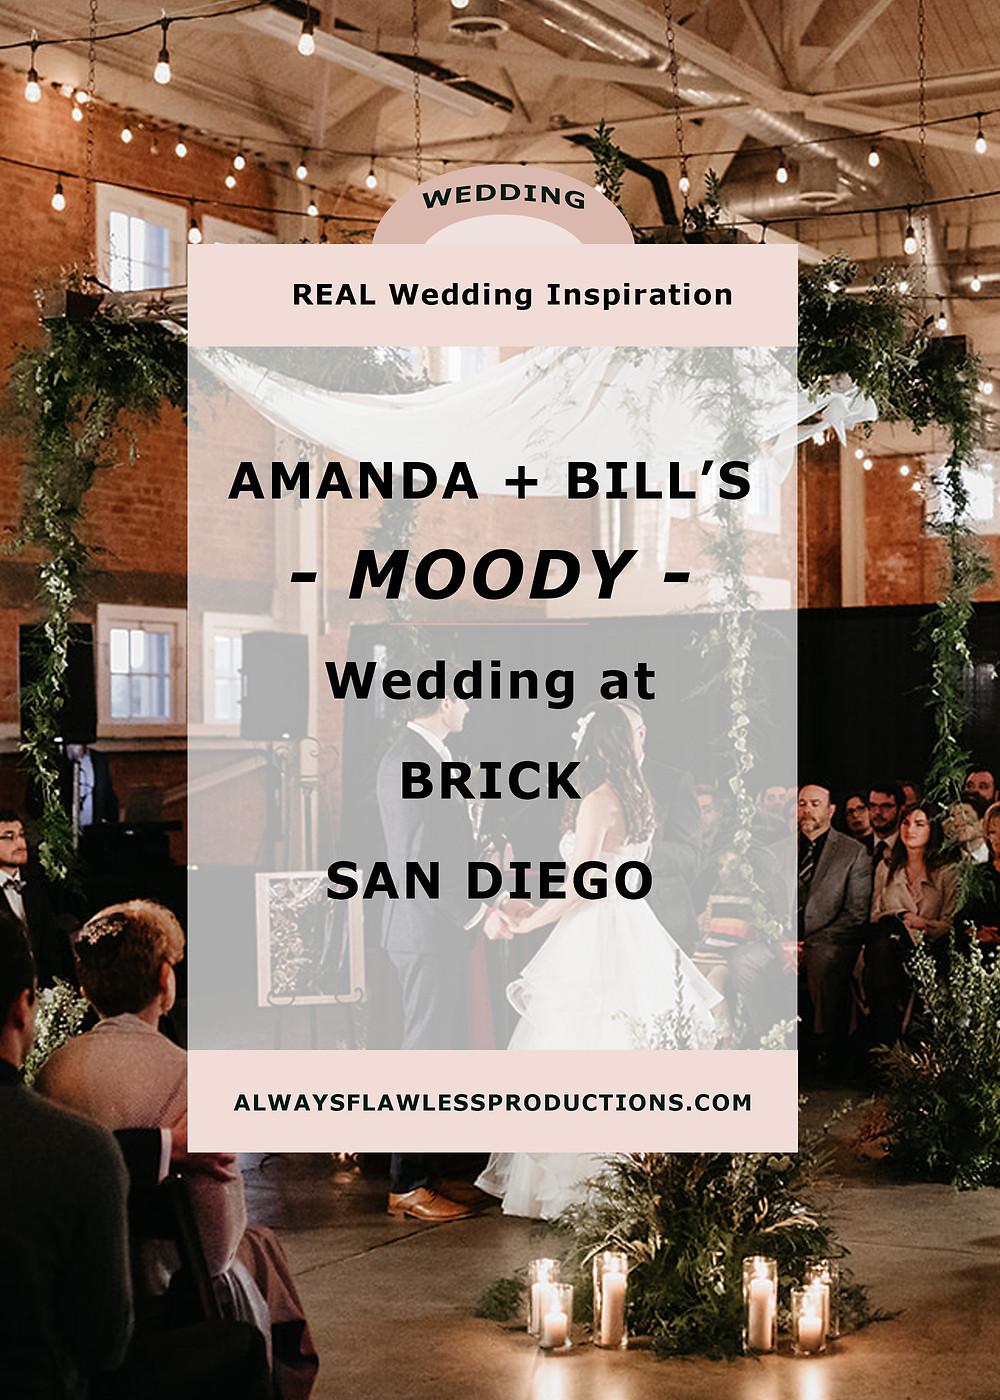 BRICK San Diego wedding